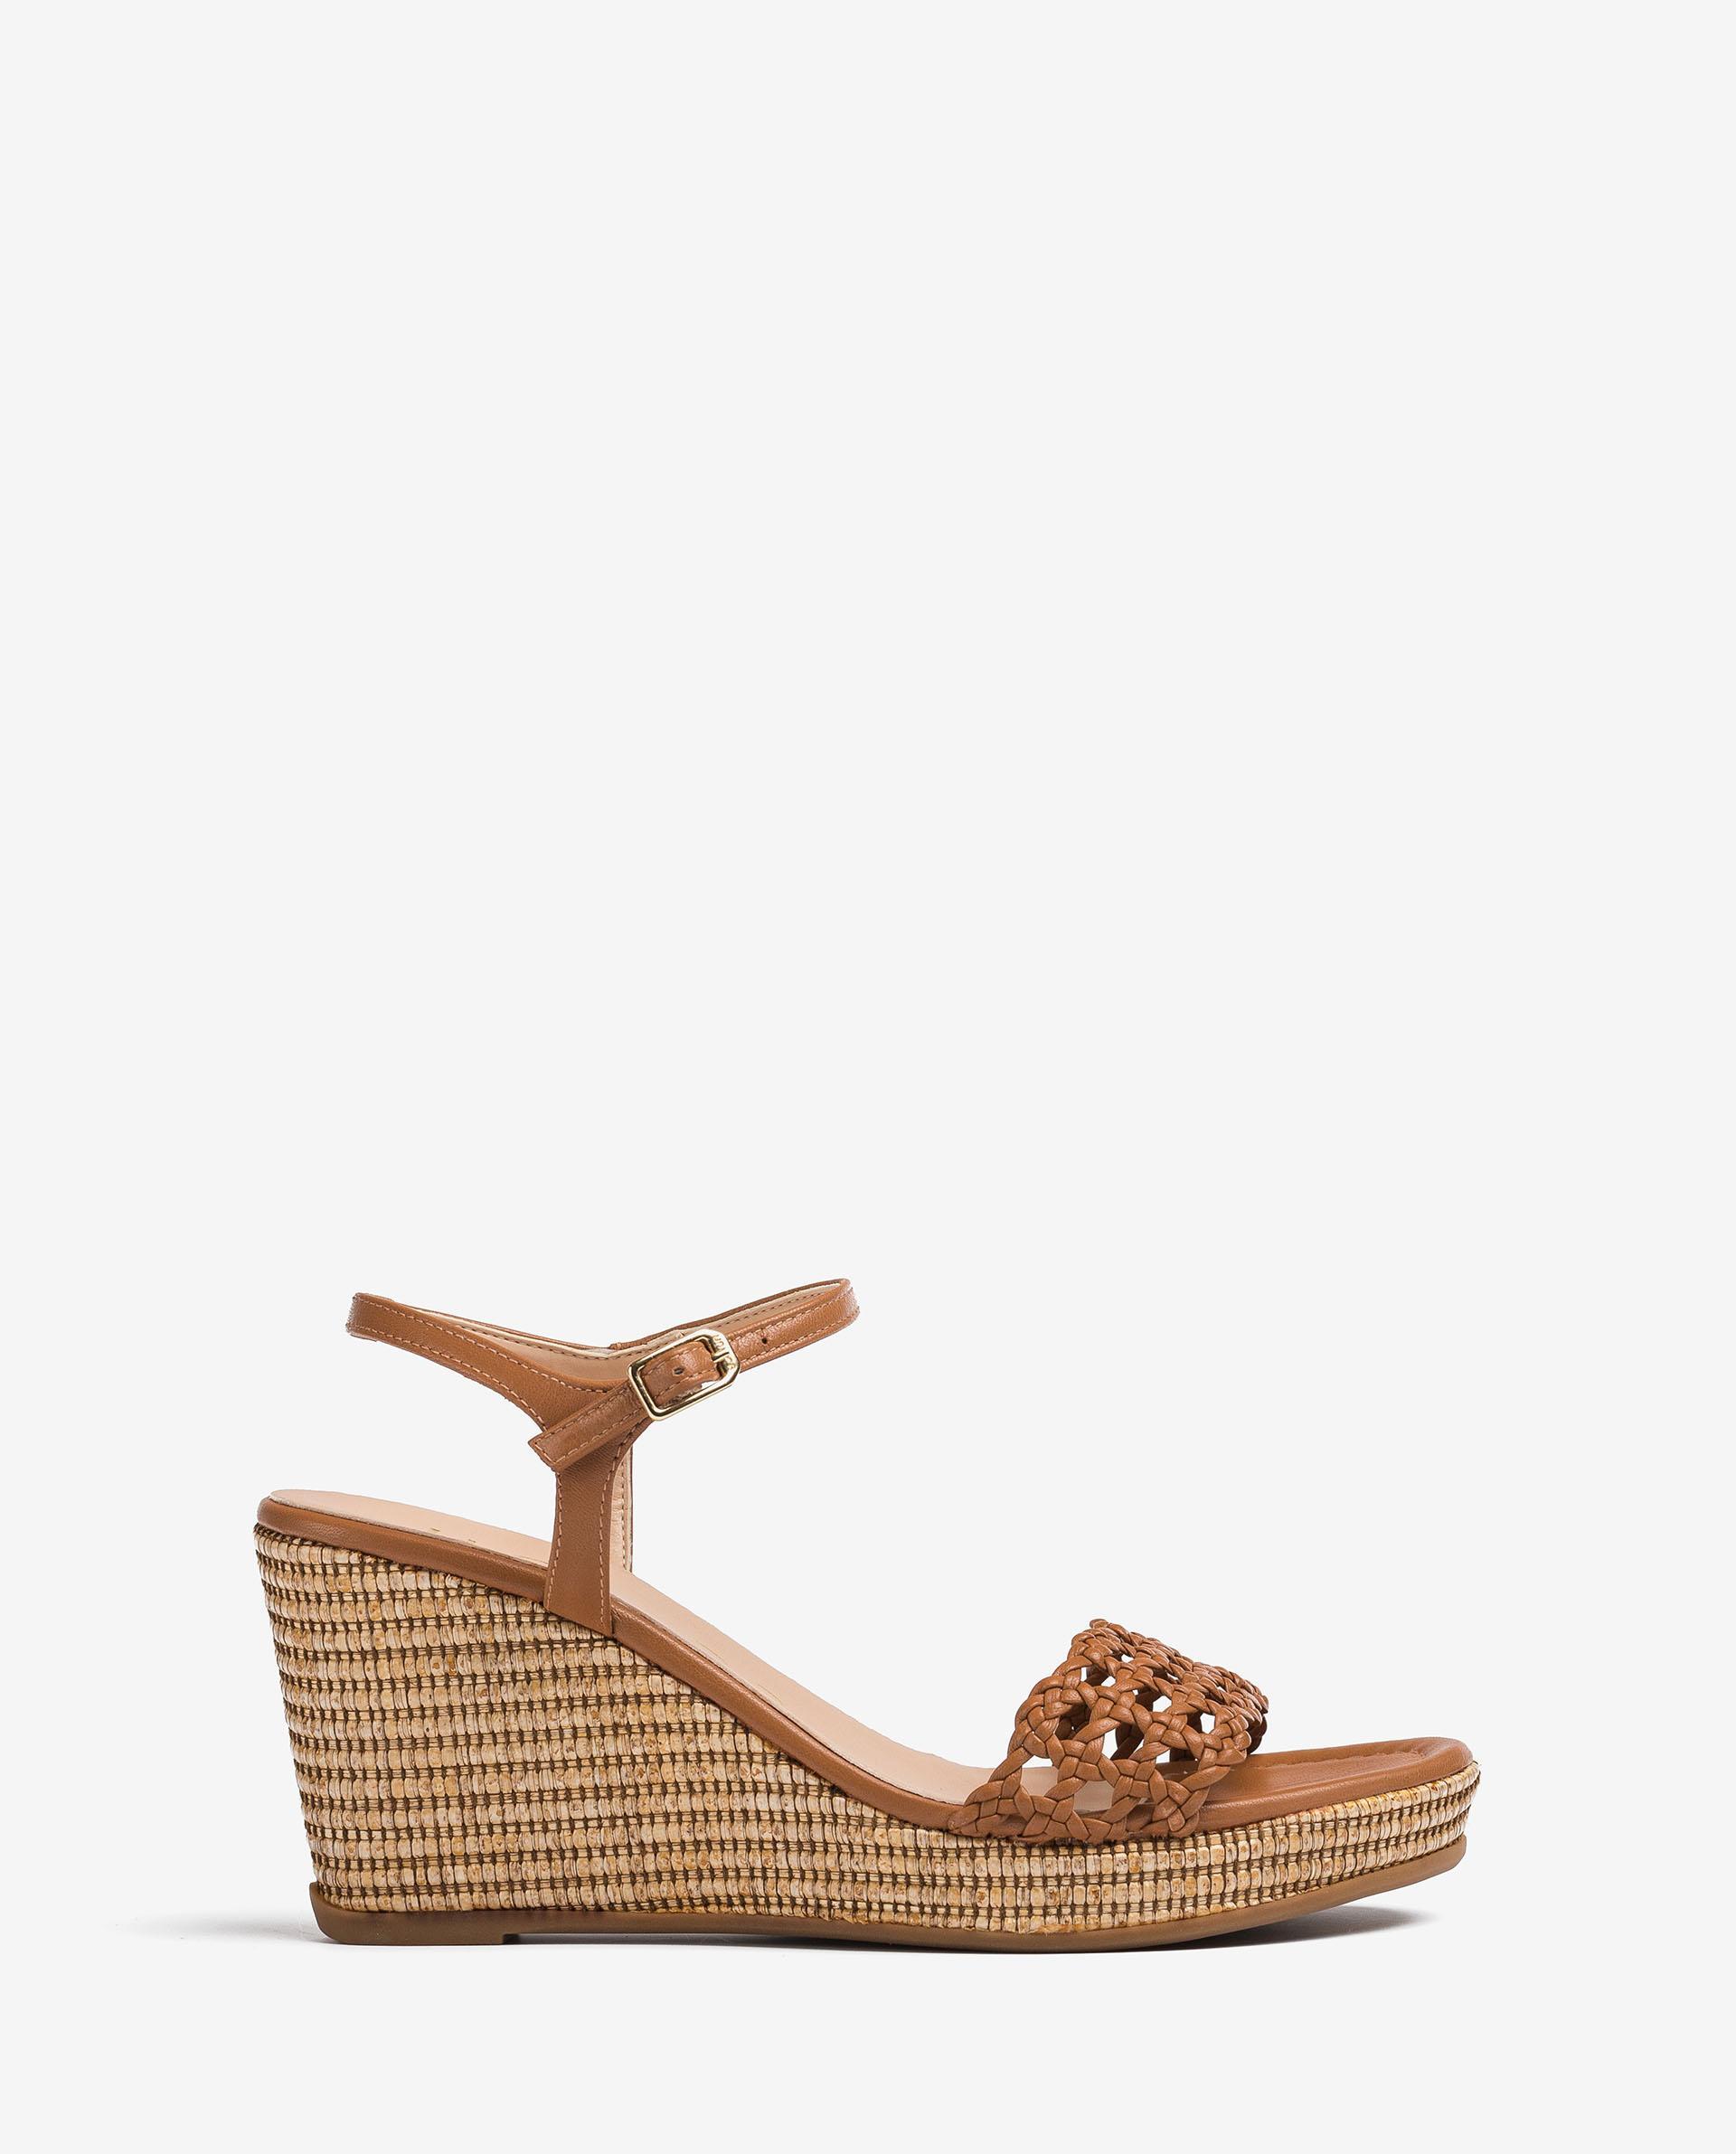 UNISA Braided leather macrame sandals LOBI_21_NA 2